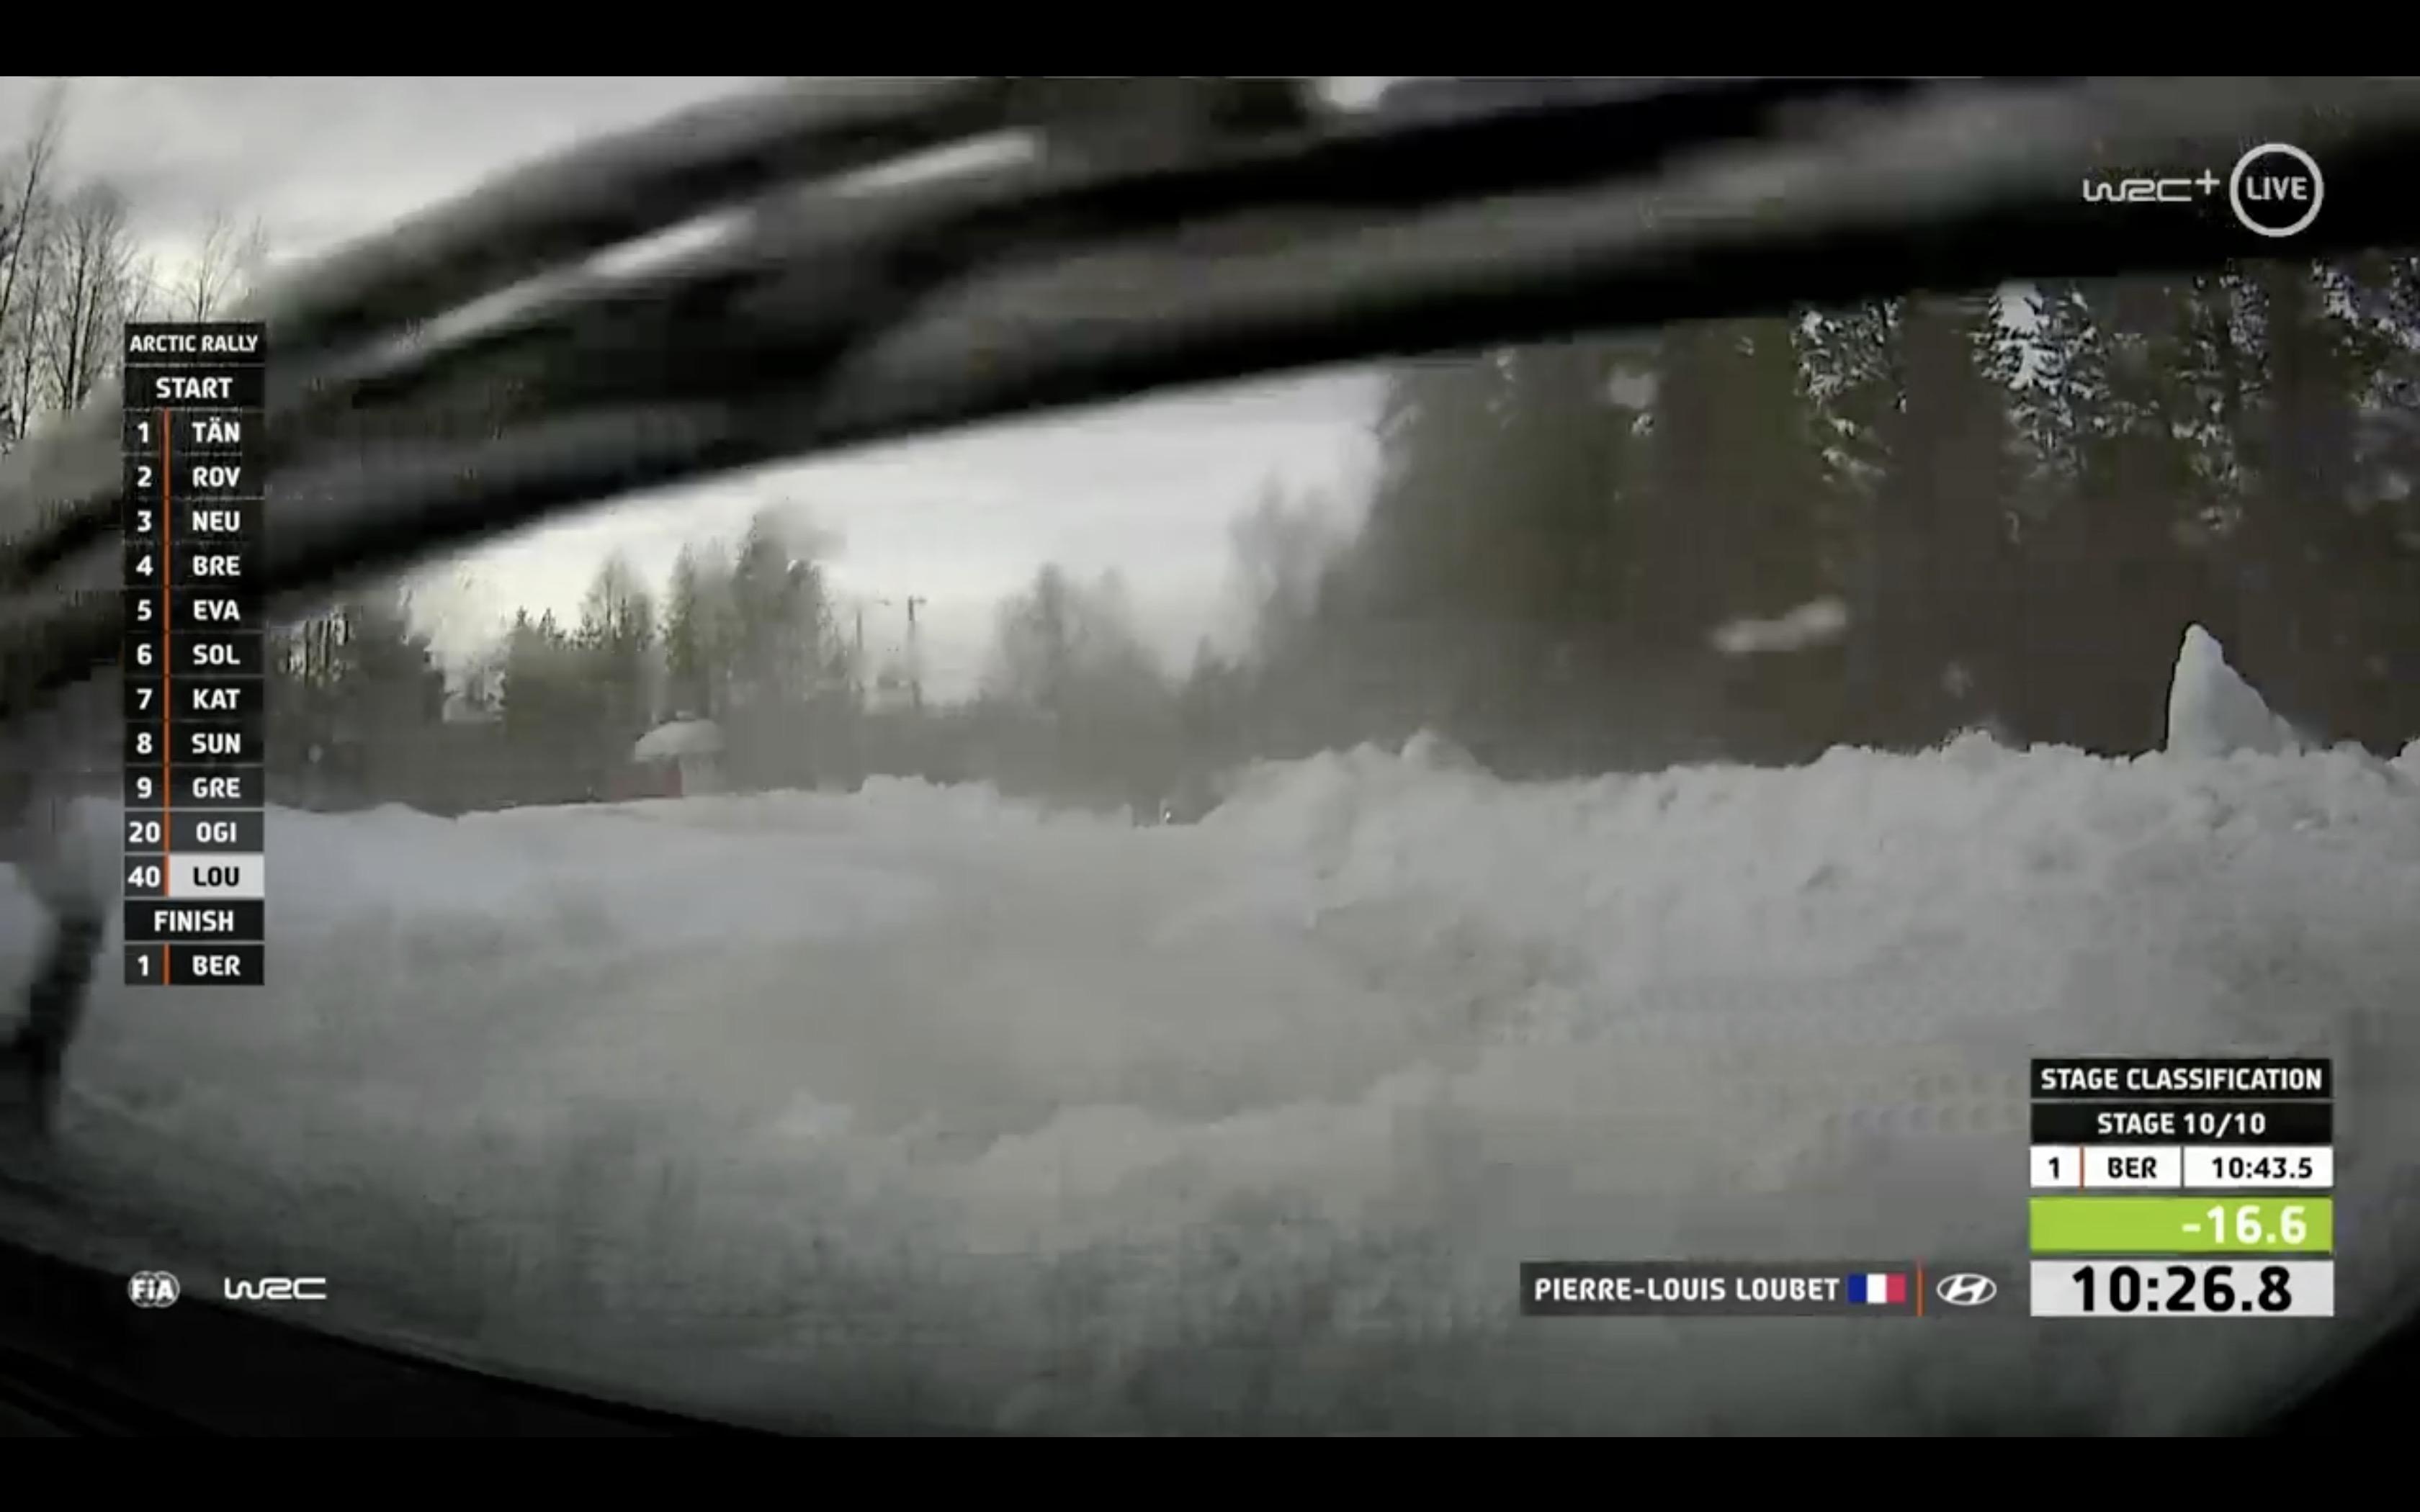 WRC: Arctic Rally Finland - Powered by CapitalBox [26-28 Febrero] - Página 7 EvT3UxJXUAQCDln?format=jpg&name=4096x4096